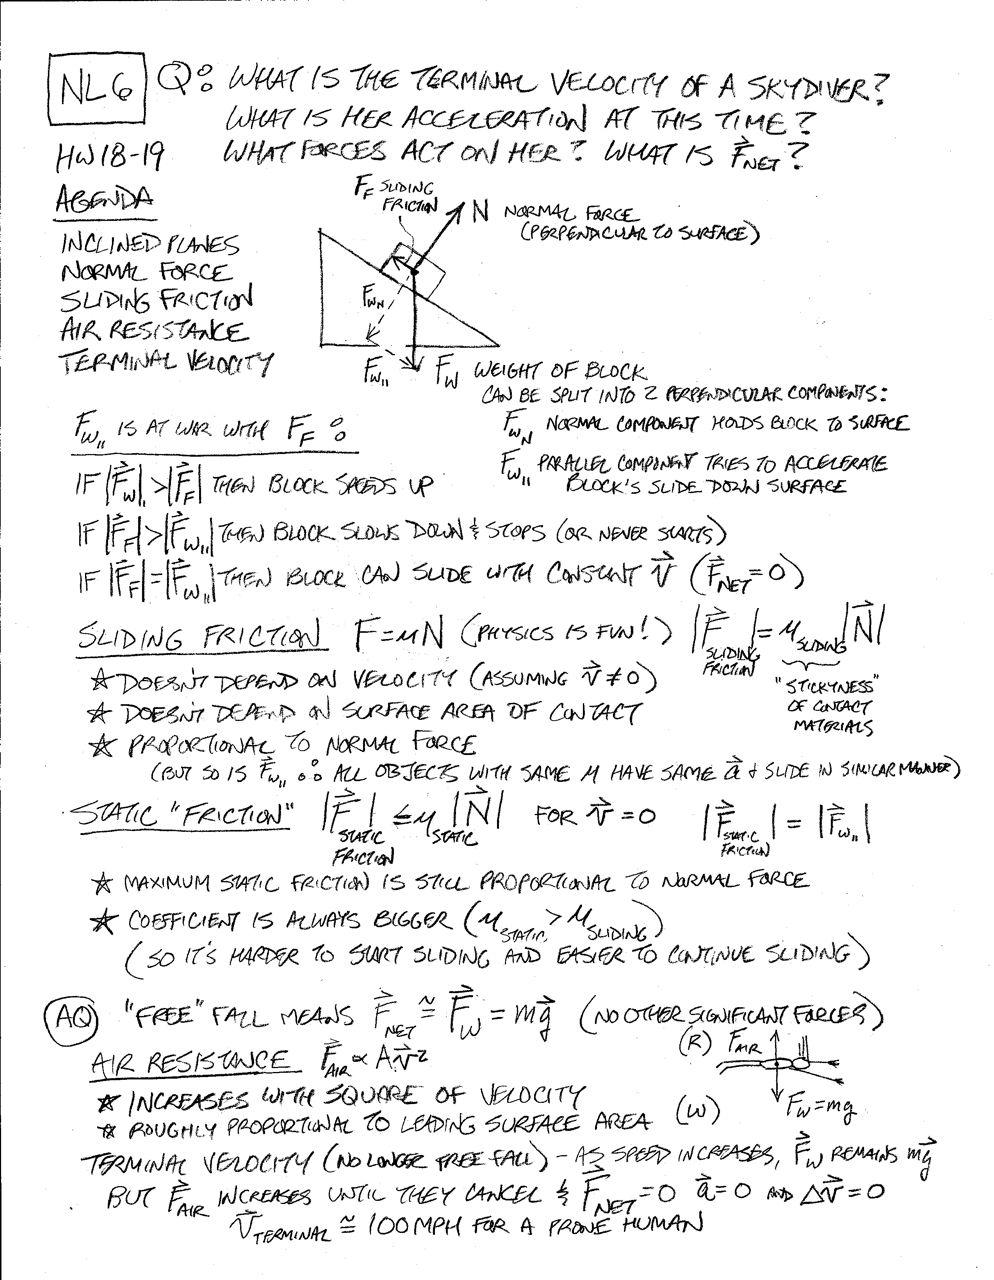 Paper terminal velocity